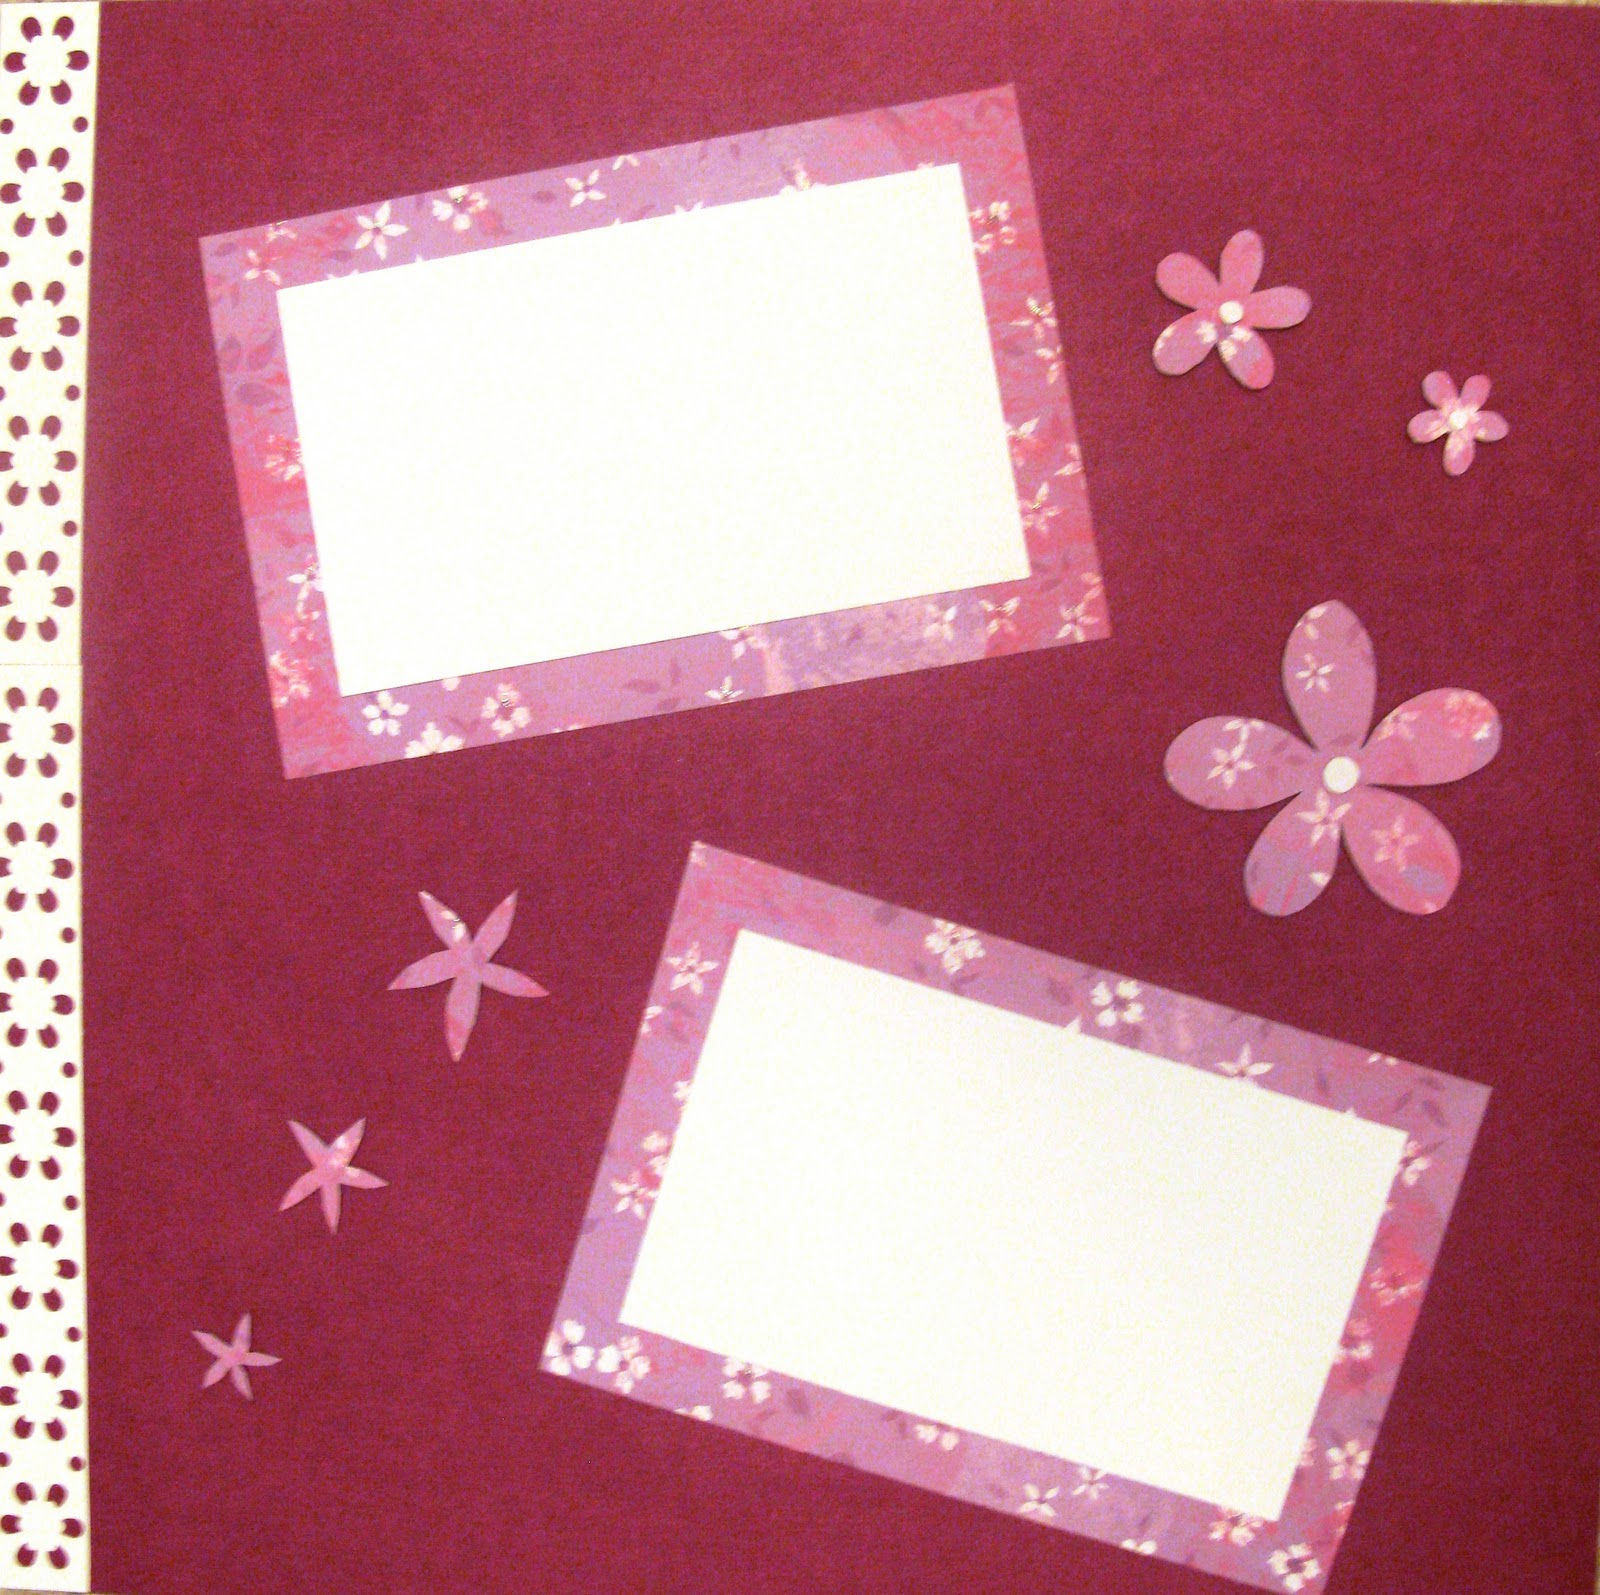 Cute easy scrapbook ideas - Cute Easy Scrapbook Ideas 31